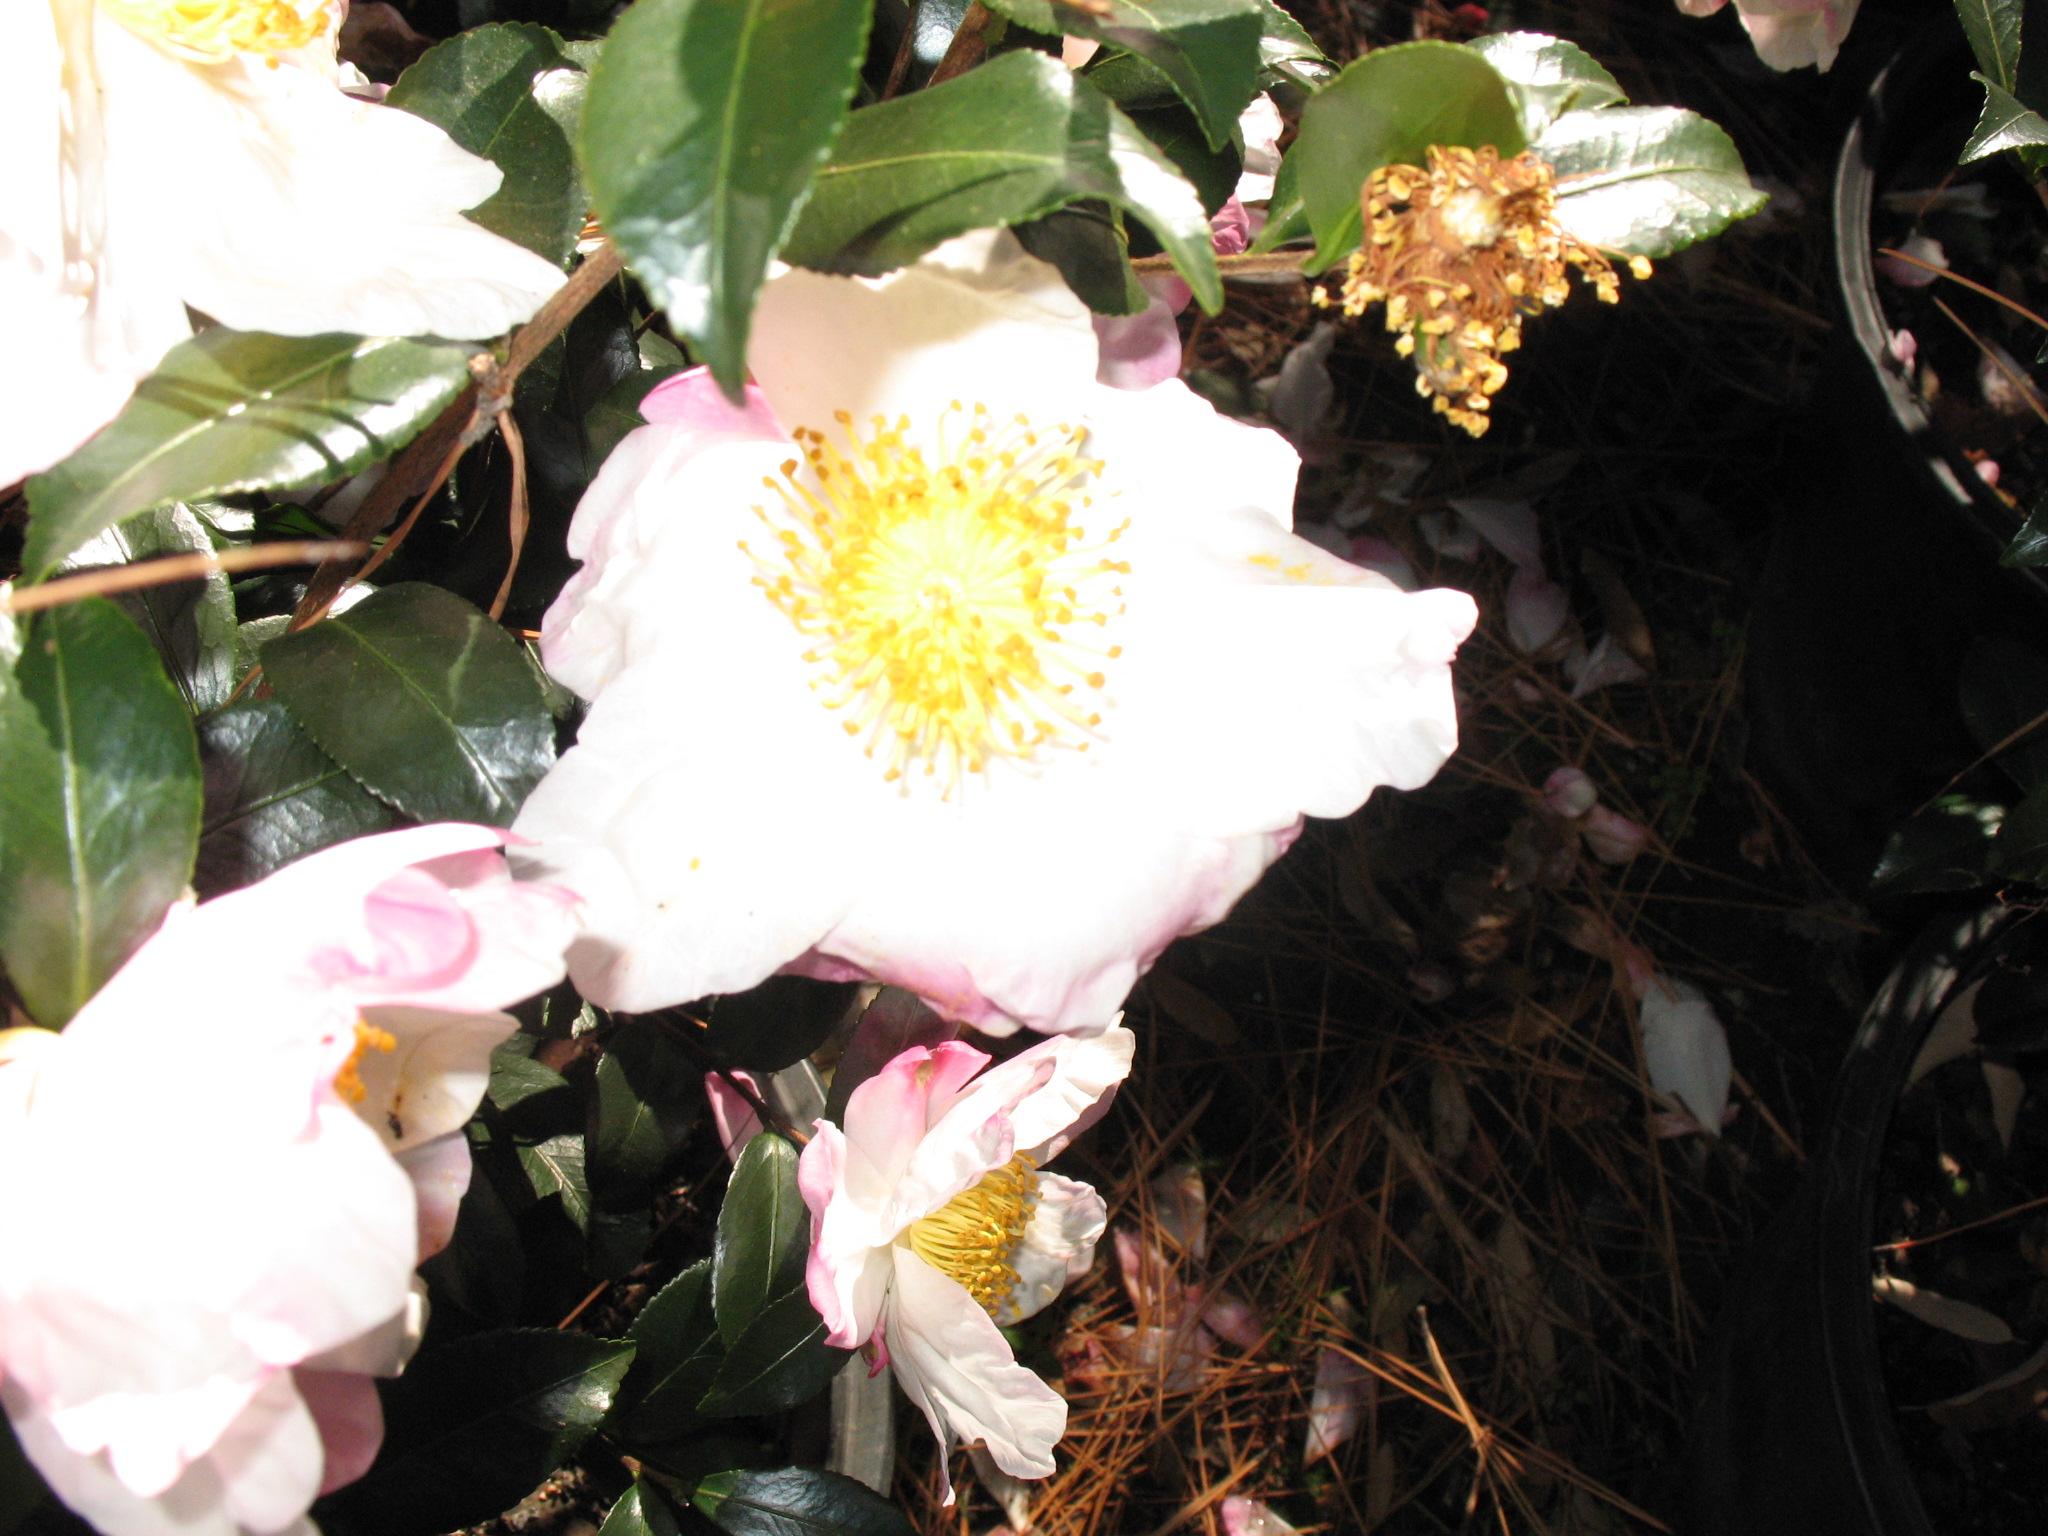 Camellia sasanqua 'Hana Jeman'  / Camellia sasanqua 'Hana Jeman'